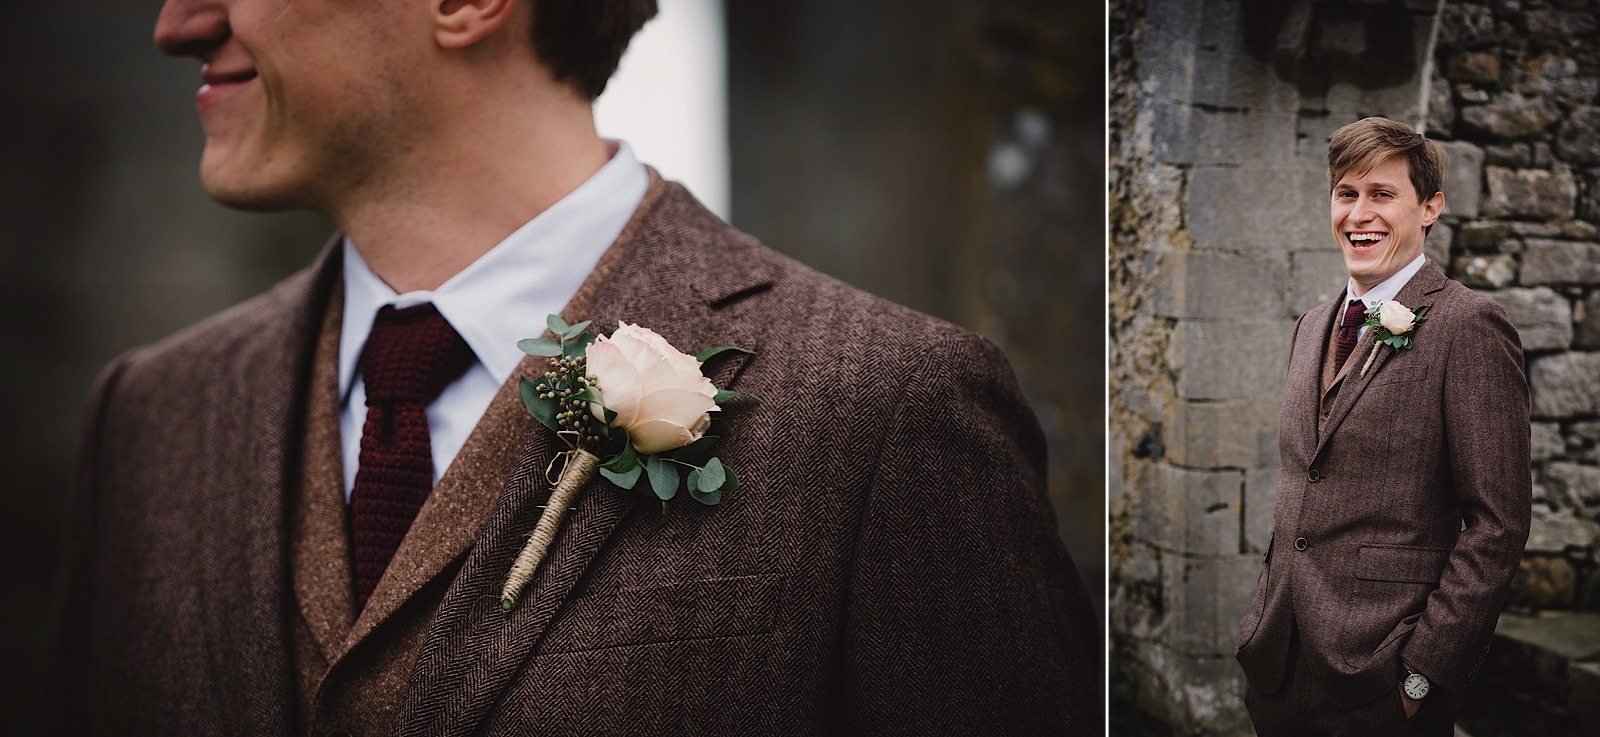 Elopement_Wedding_Ireland_Cliffs_of_moher0009